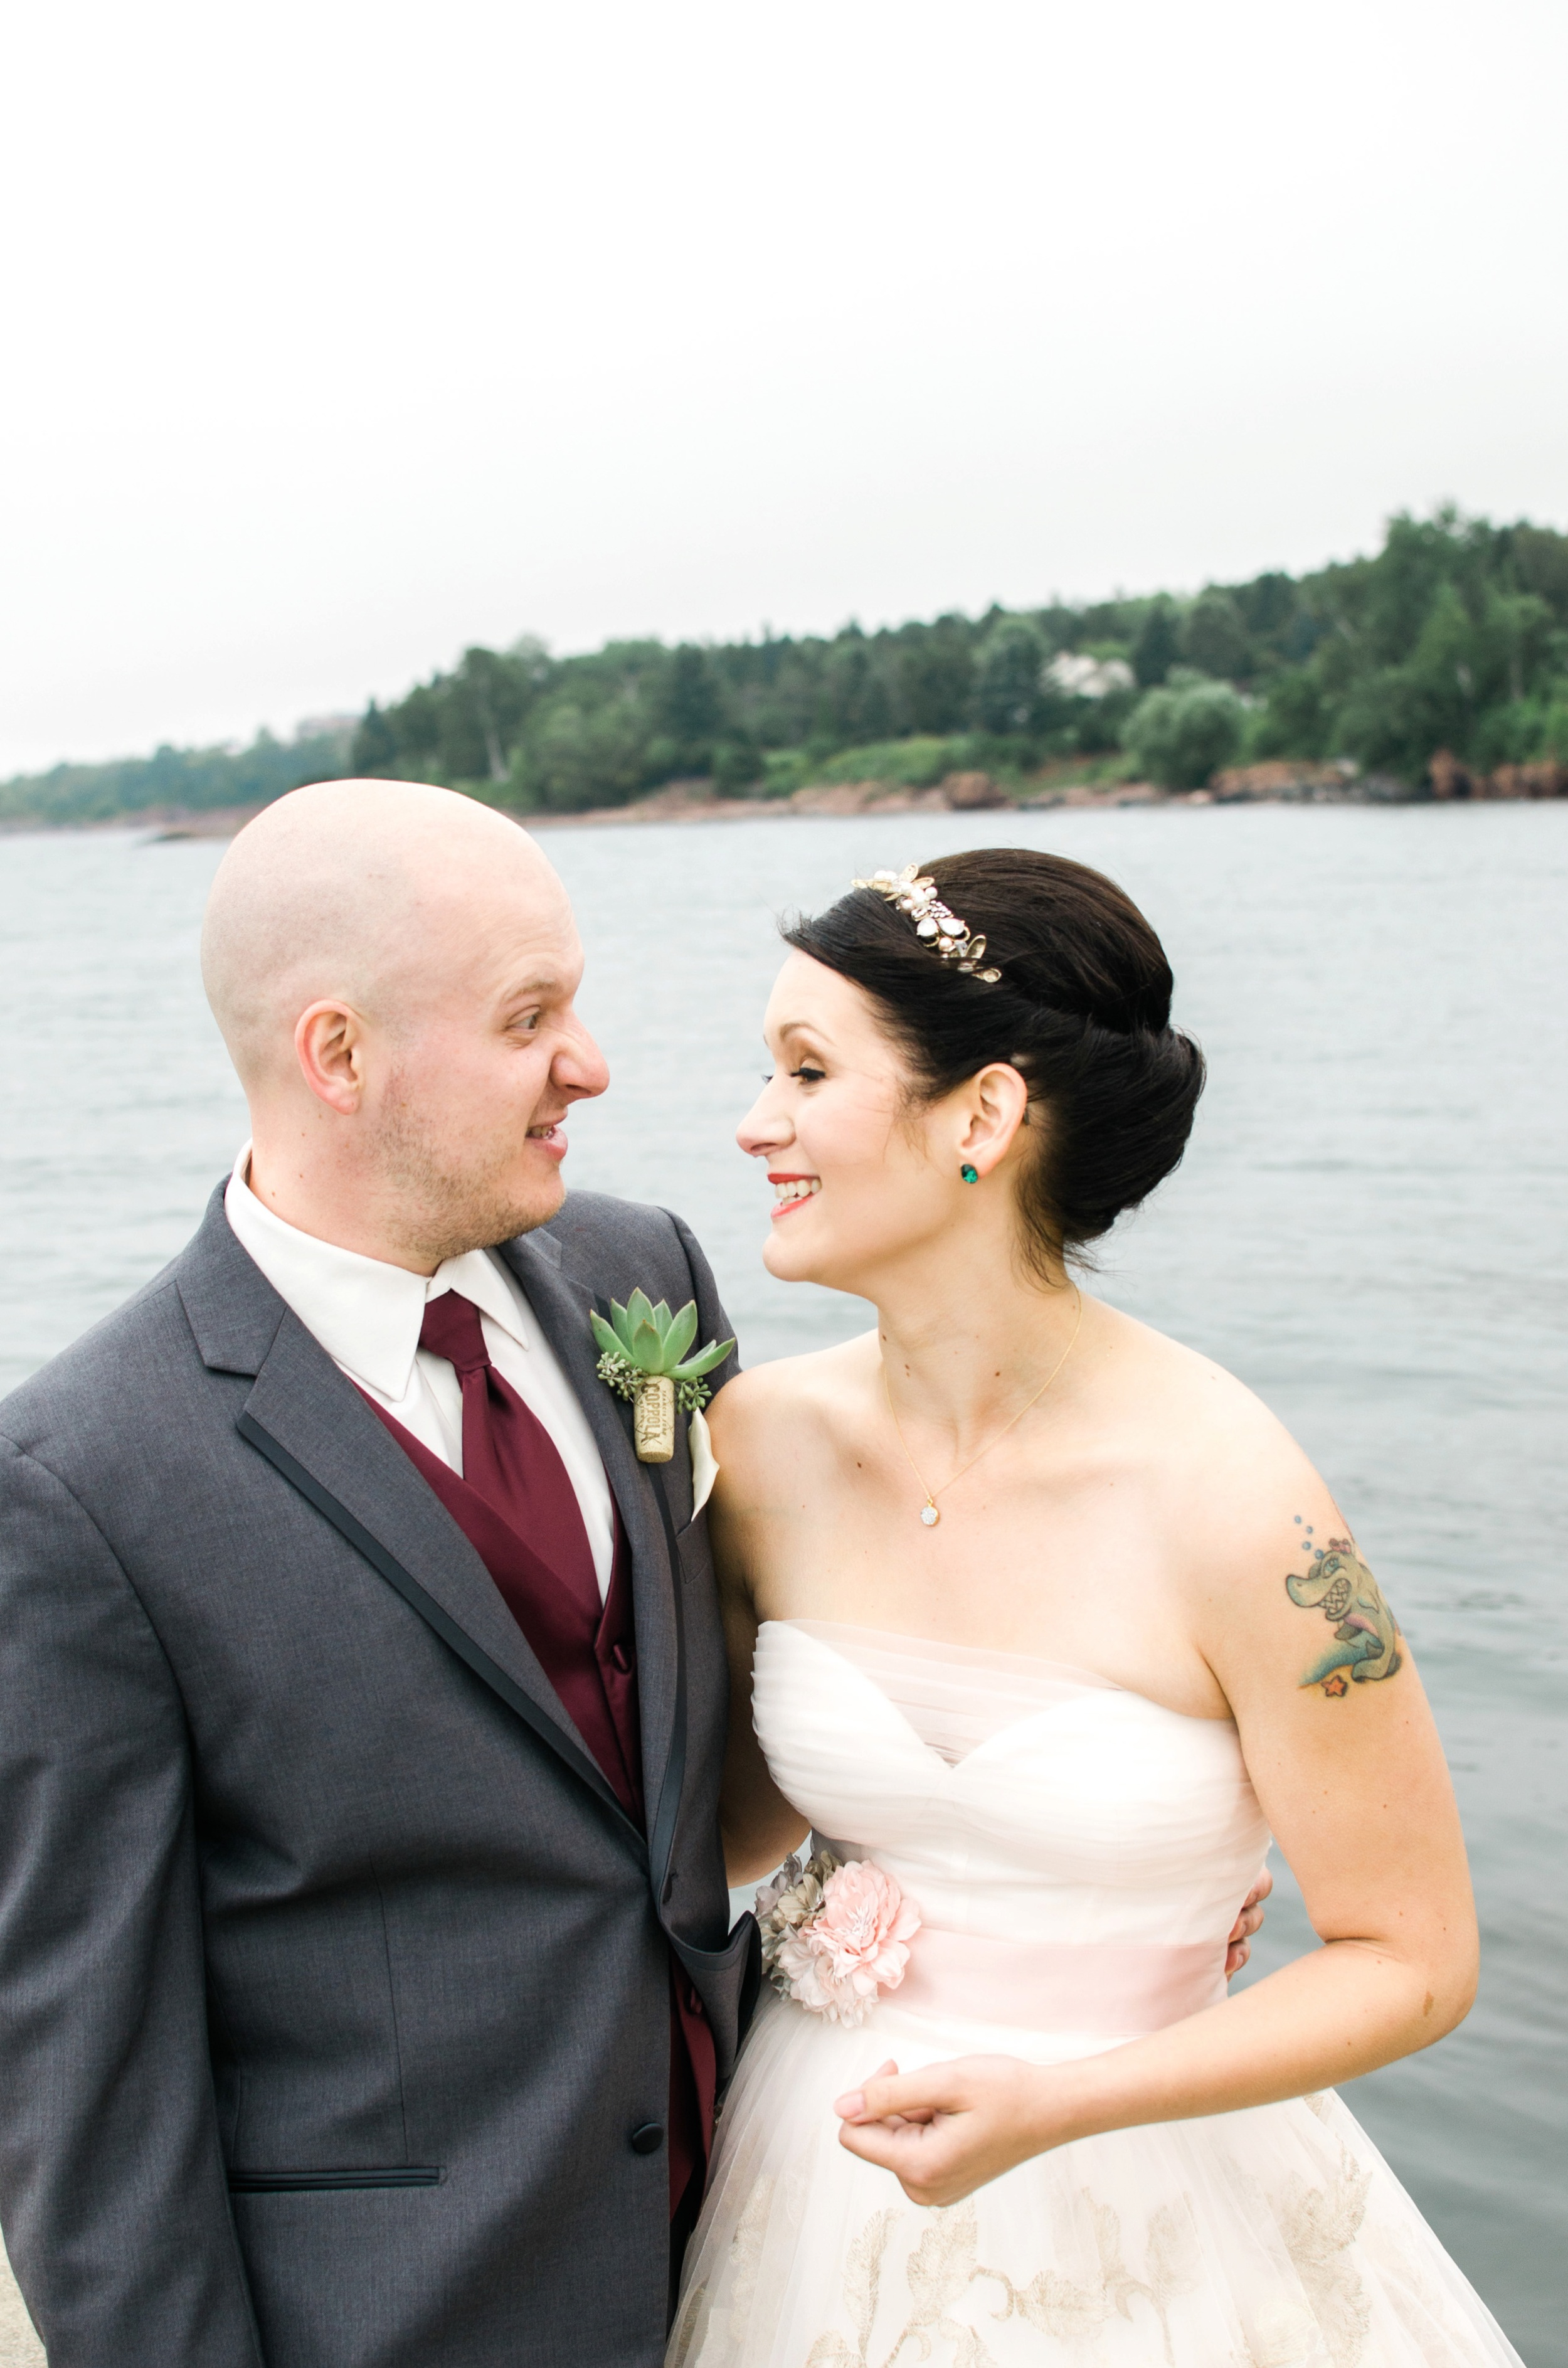 Glensheen Mansion Wedding | Duluth, MN Wedding Photographer_0500.jpg